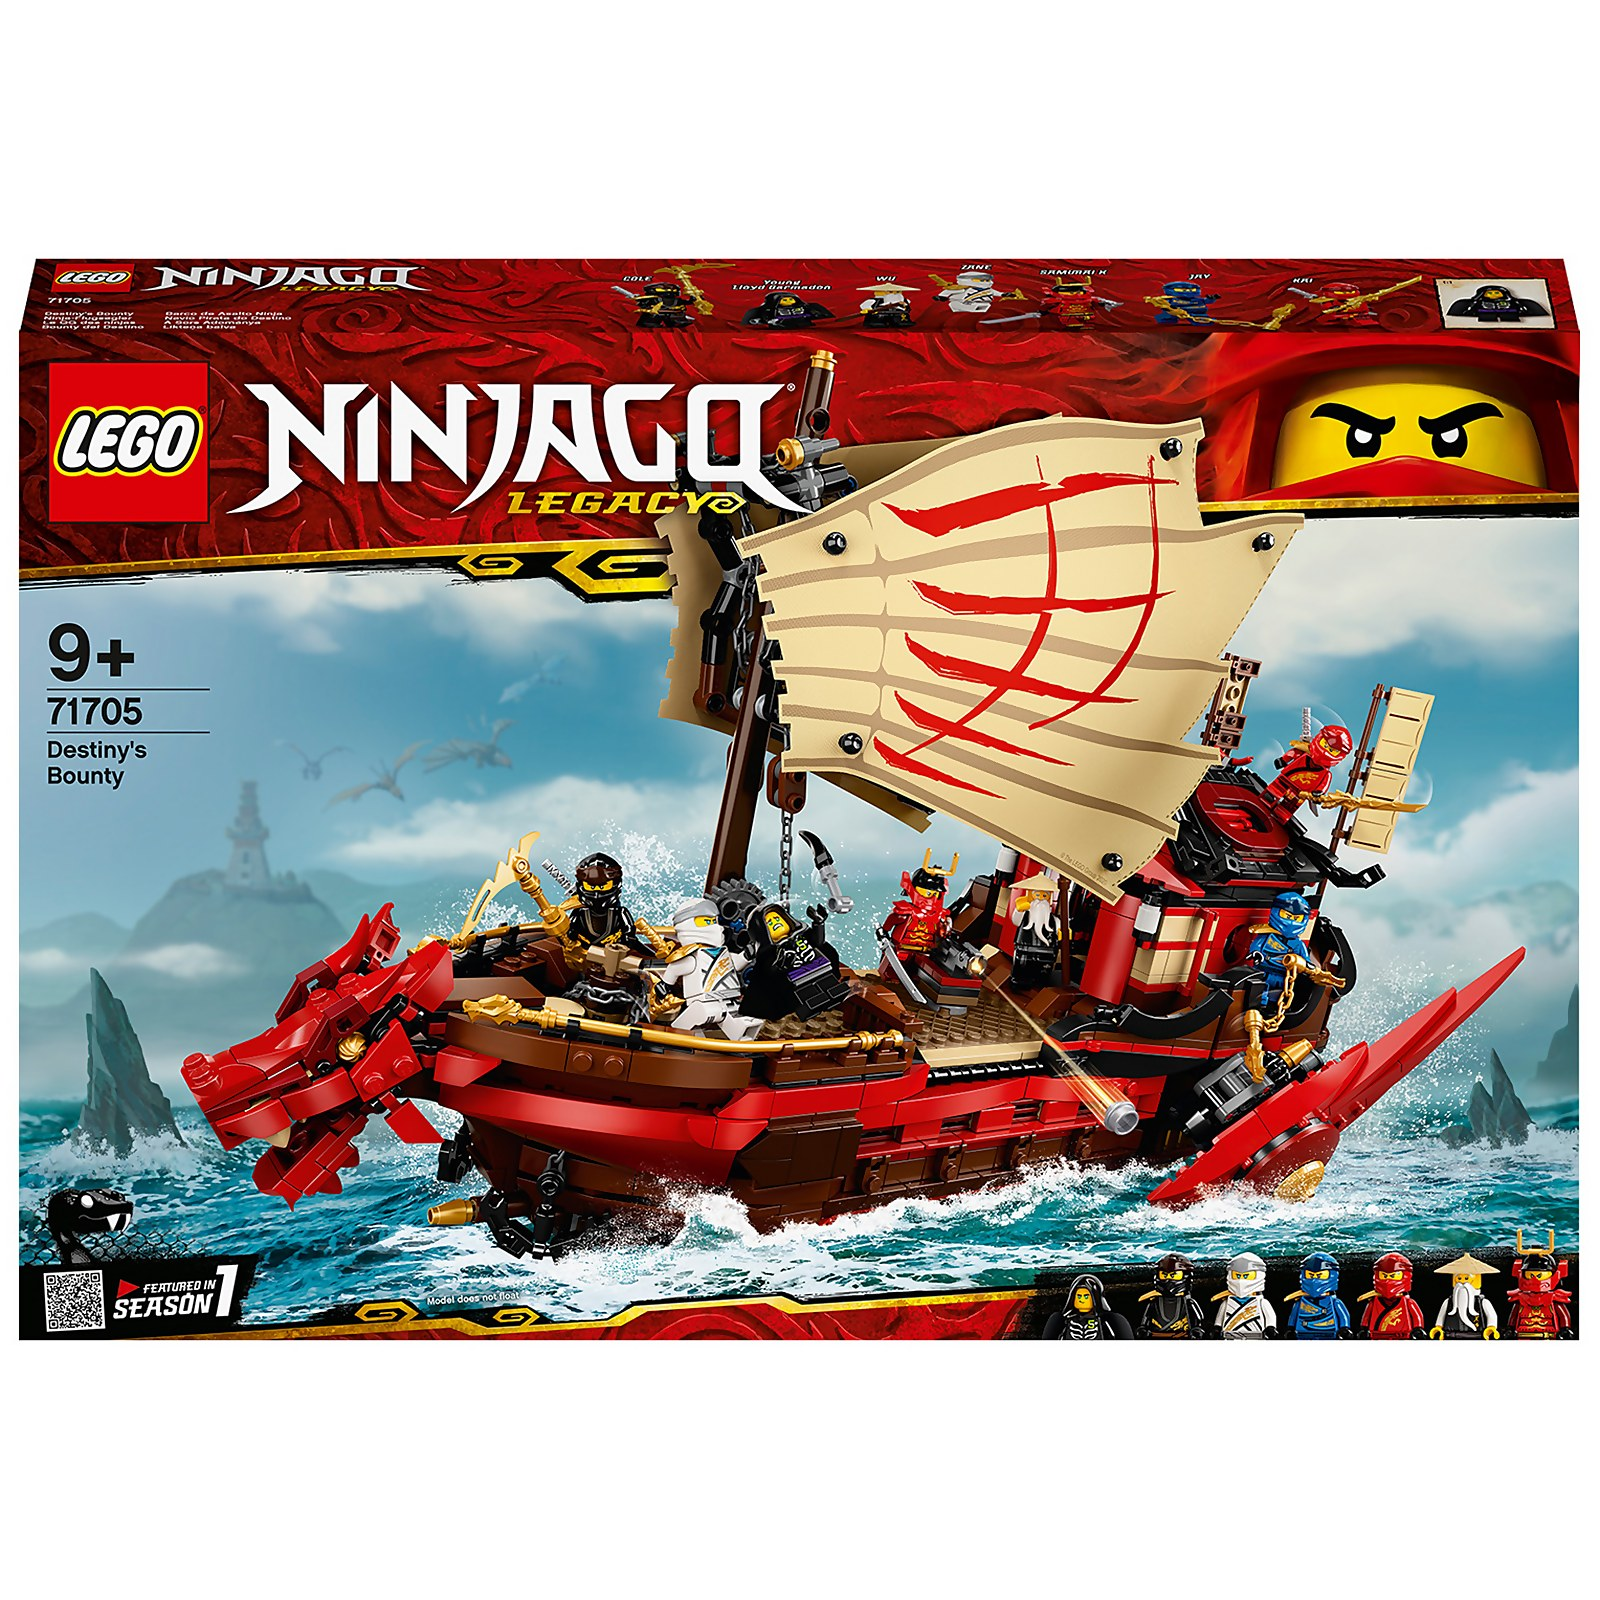 Image of 71705 LEGO® NINJAGO Ninja-Flying sailer